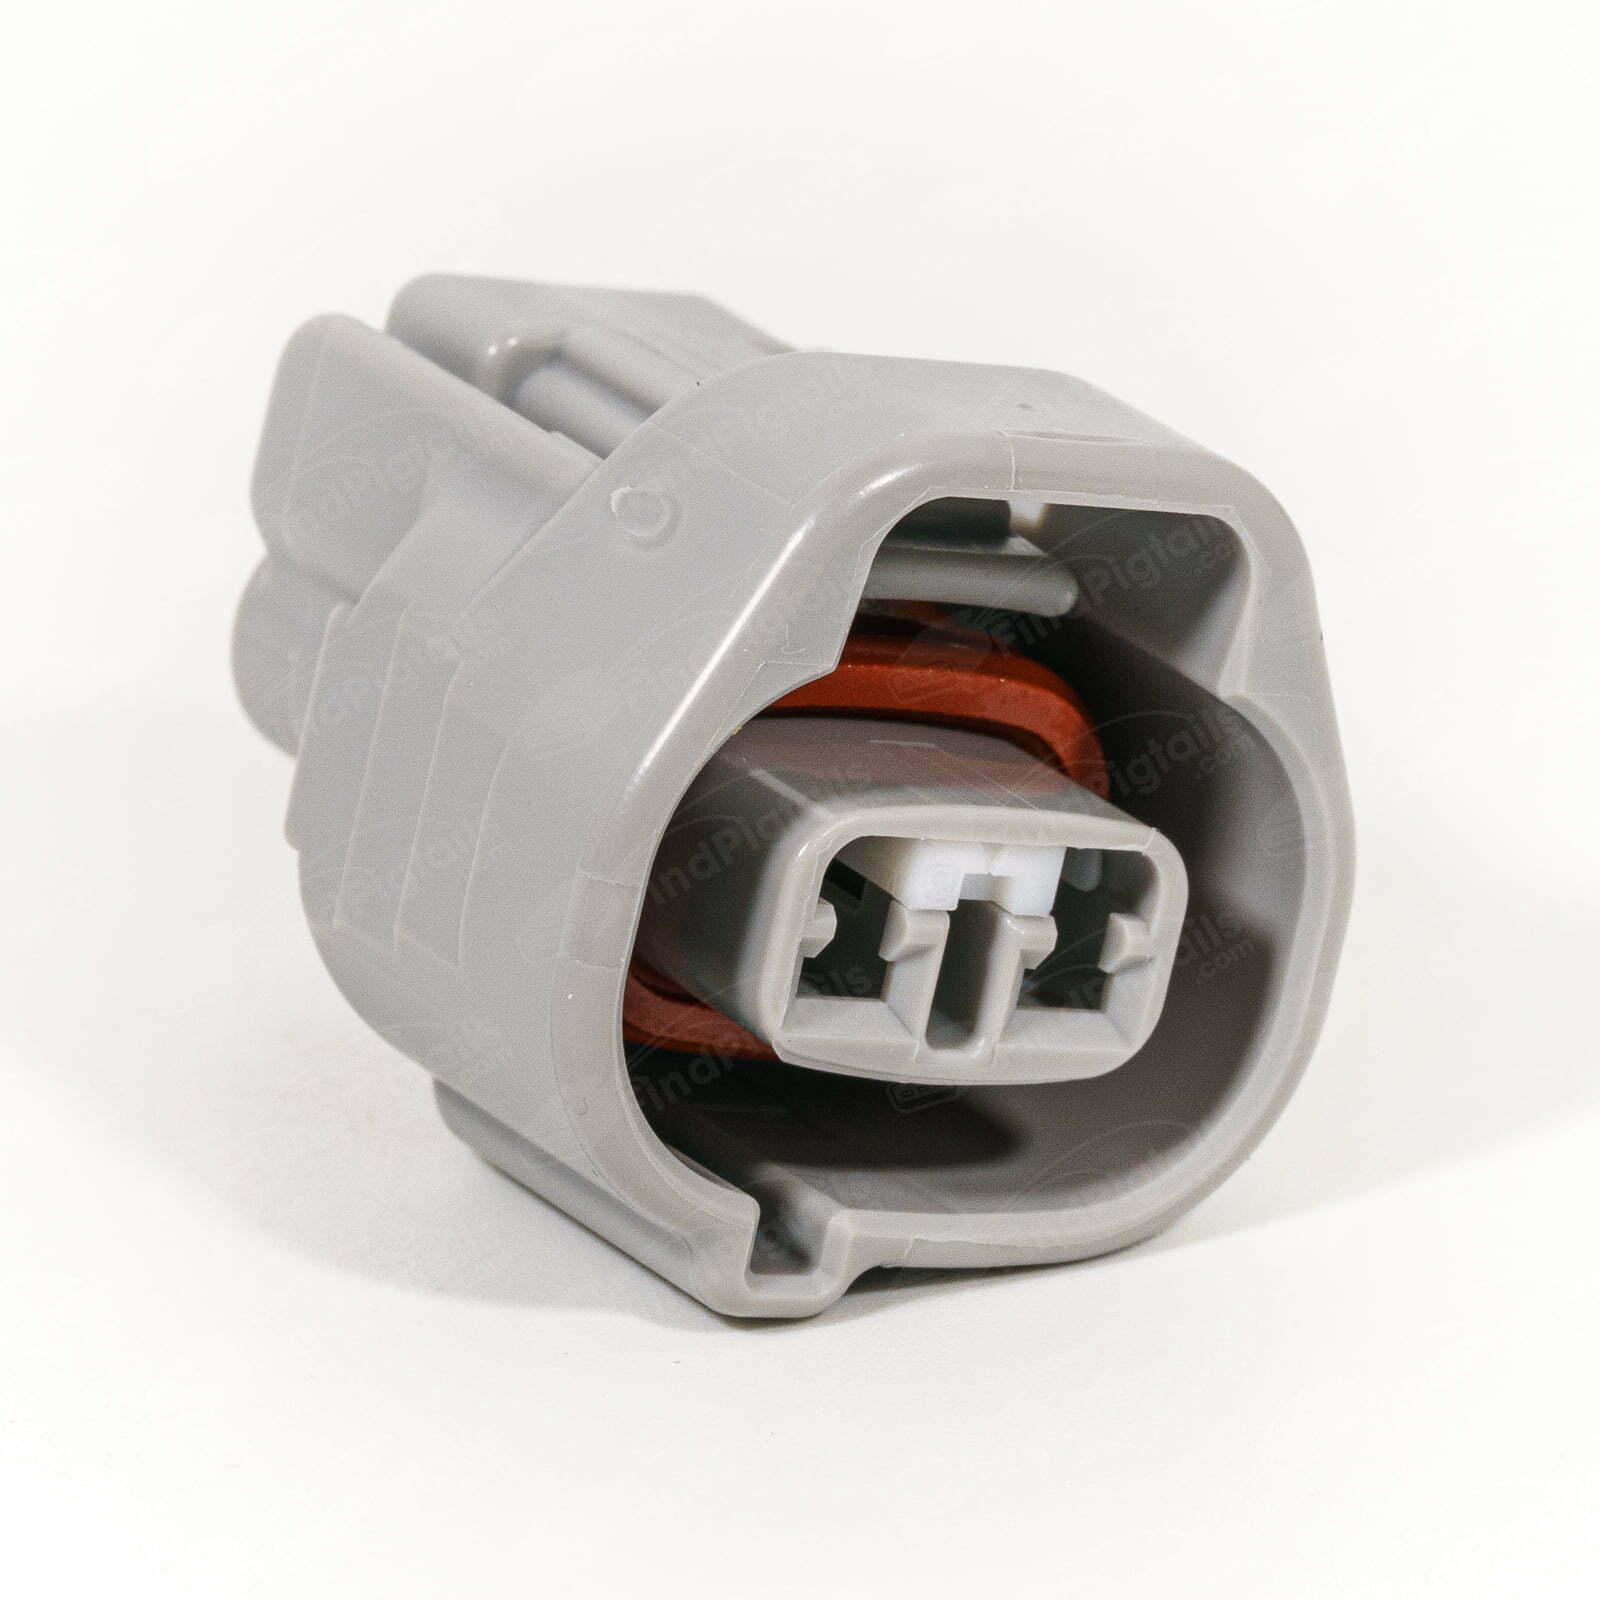 FindPigtails-Connector-SKU-Y110B2-0001